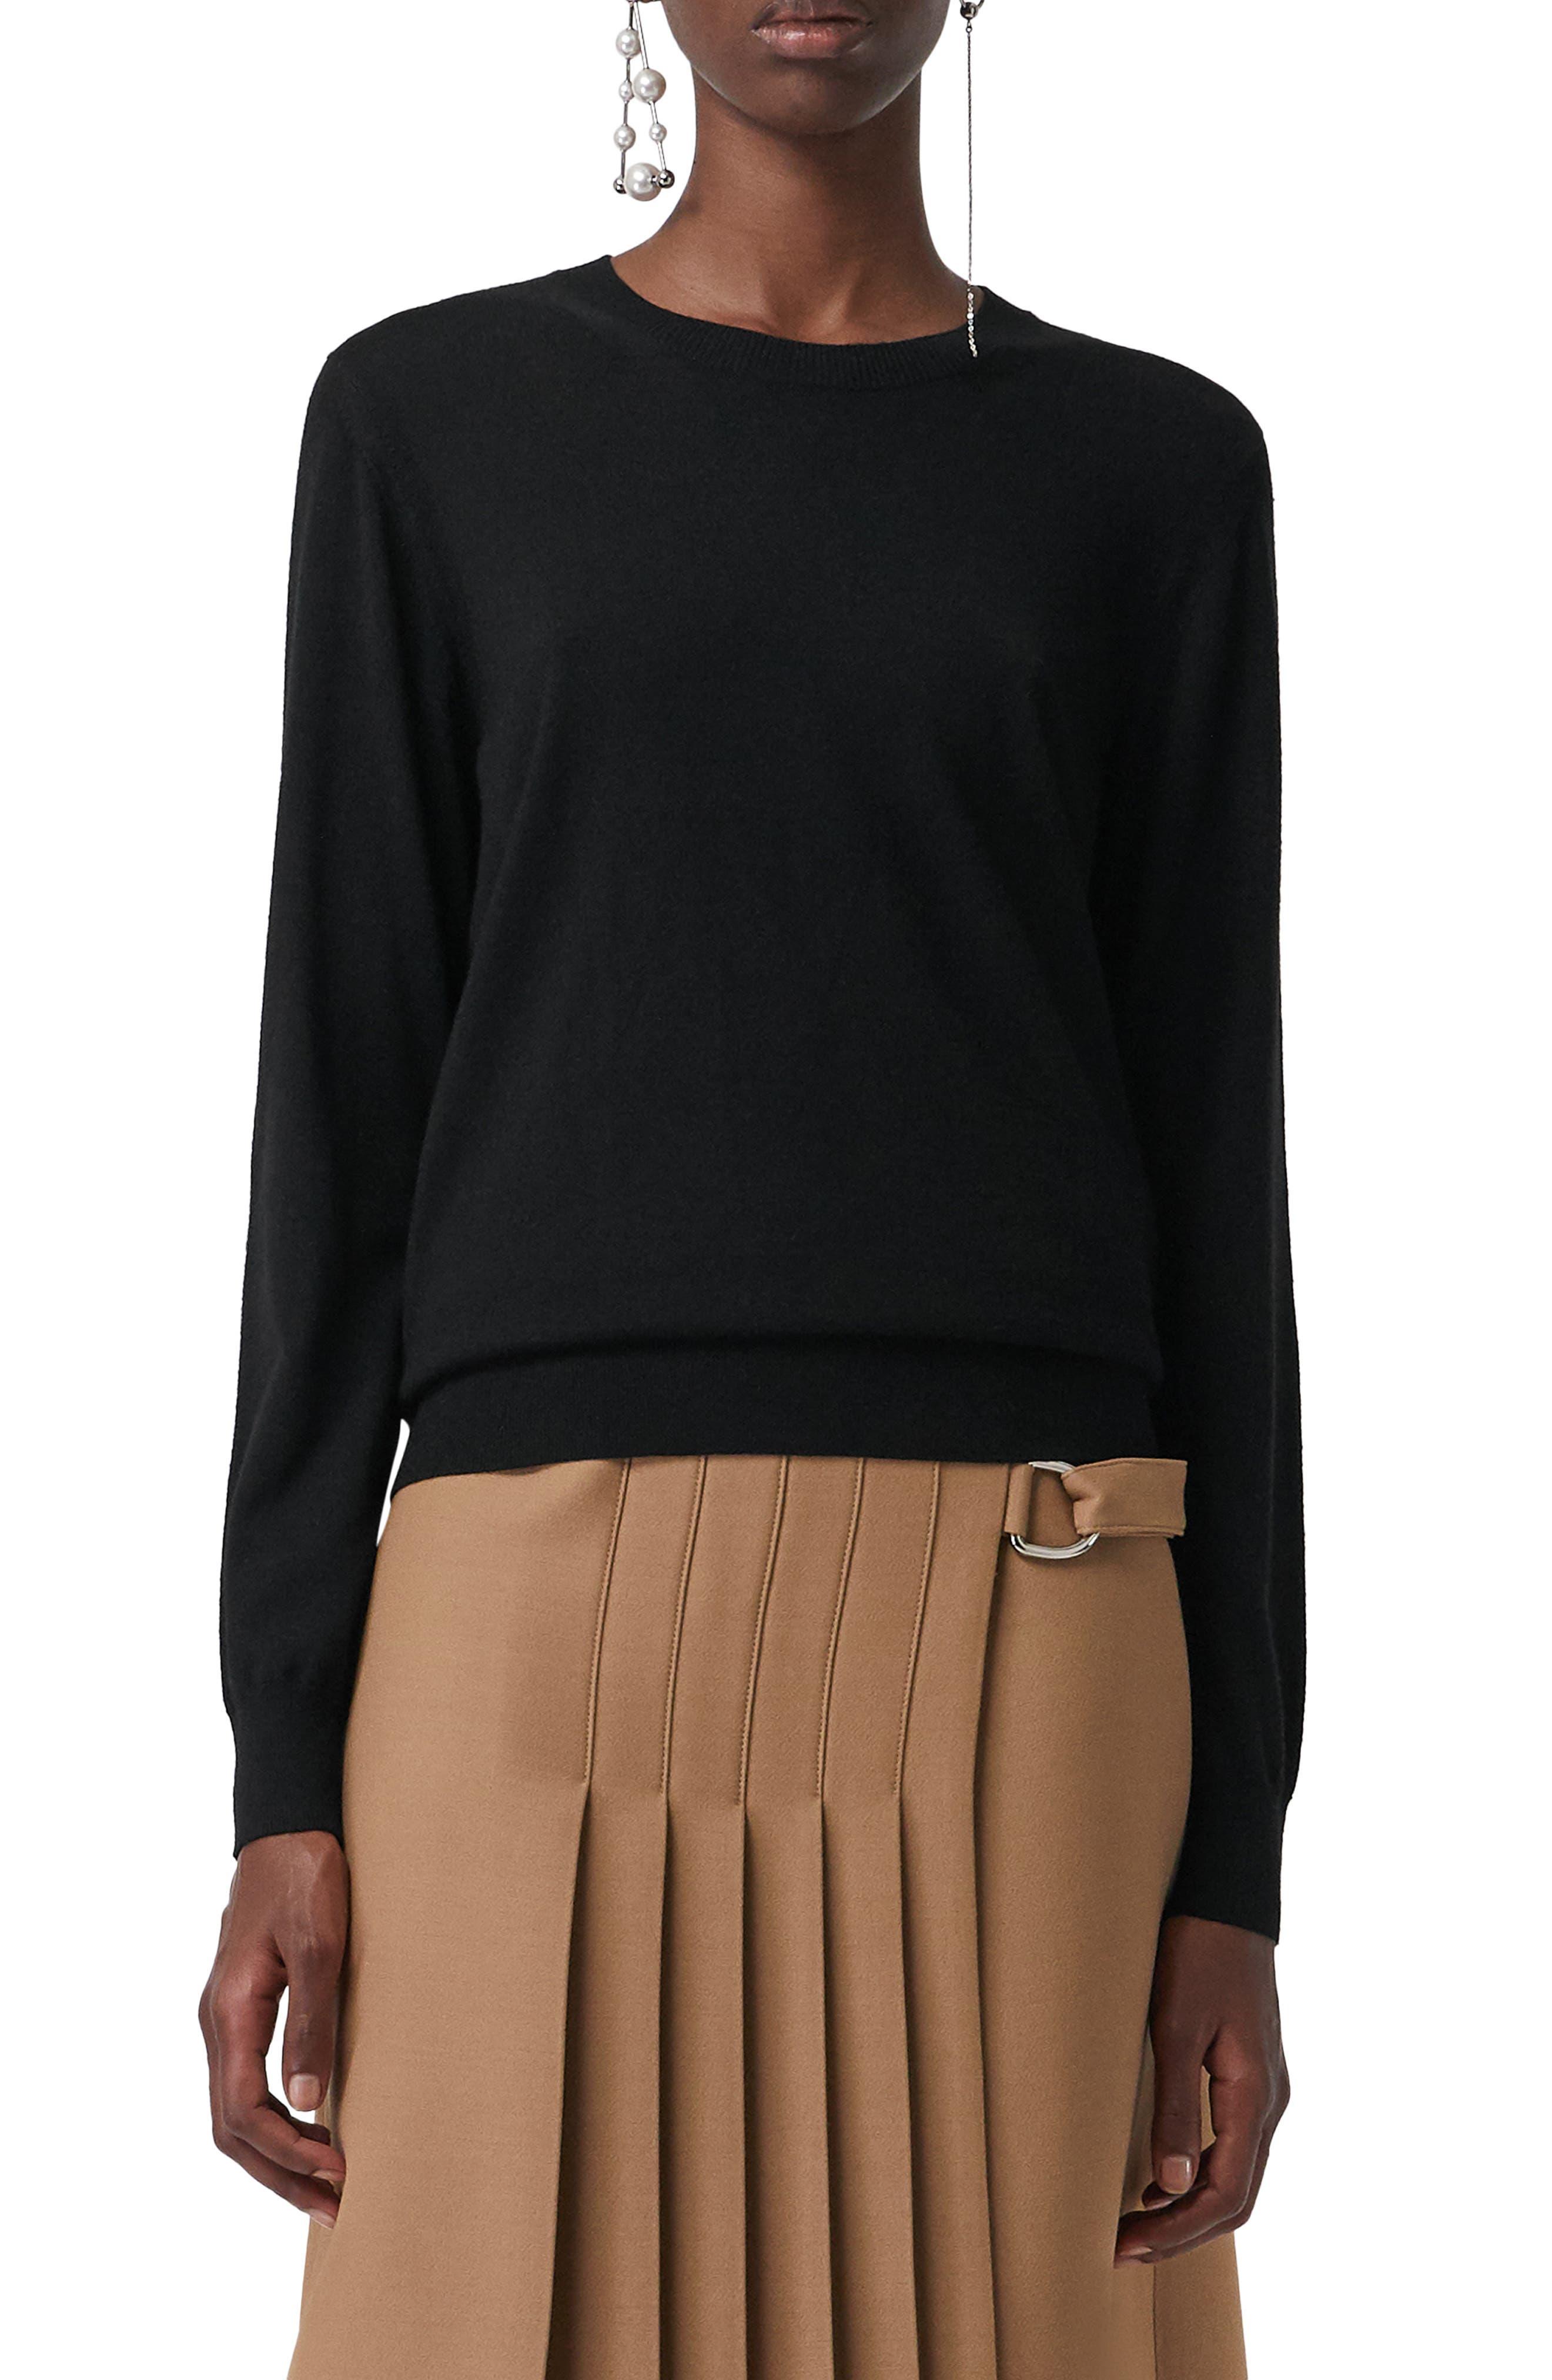 Burberry Bempton Tartan Elbow Patch Merino Wool Sweater, Black